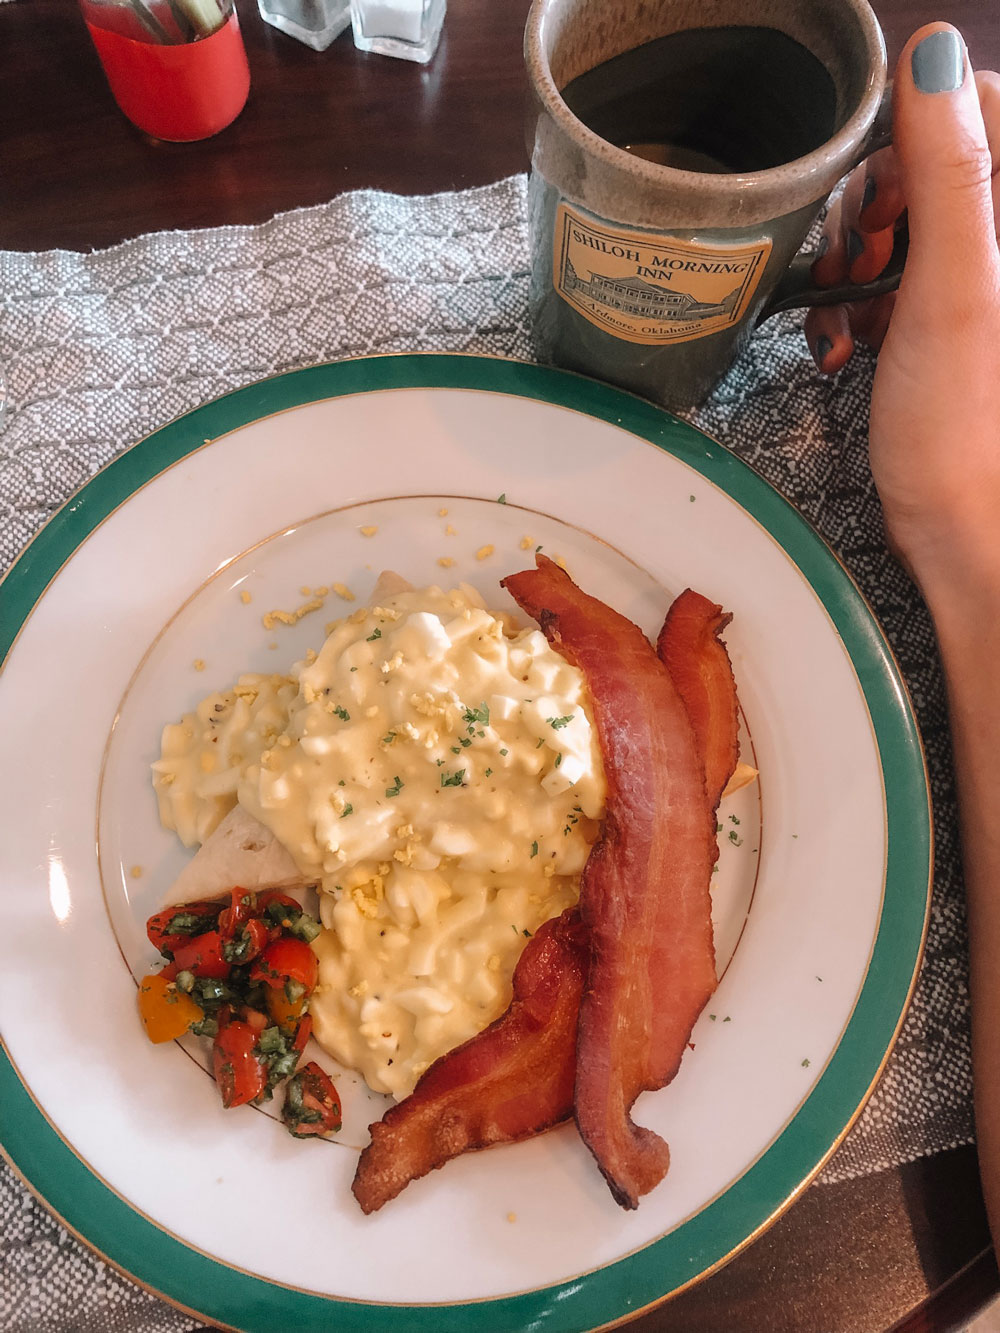 Breakfast at Shiloh Morning Inn B&B